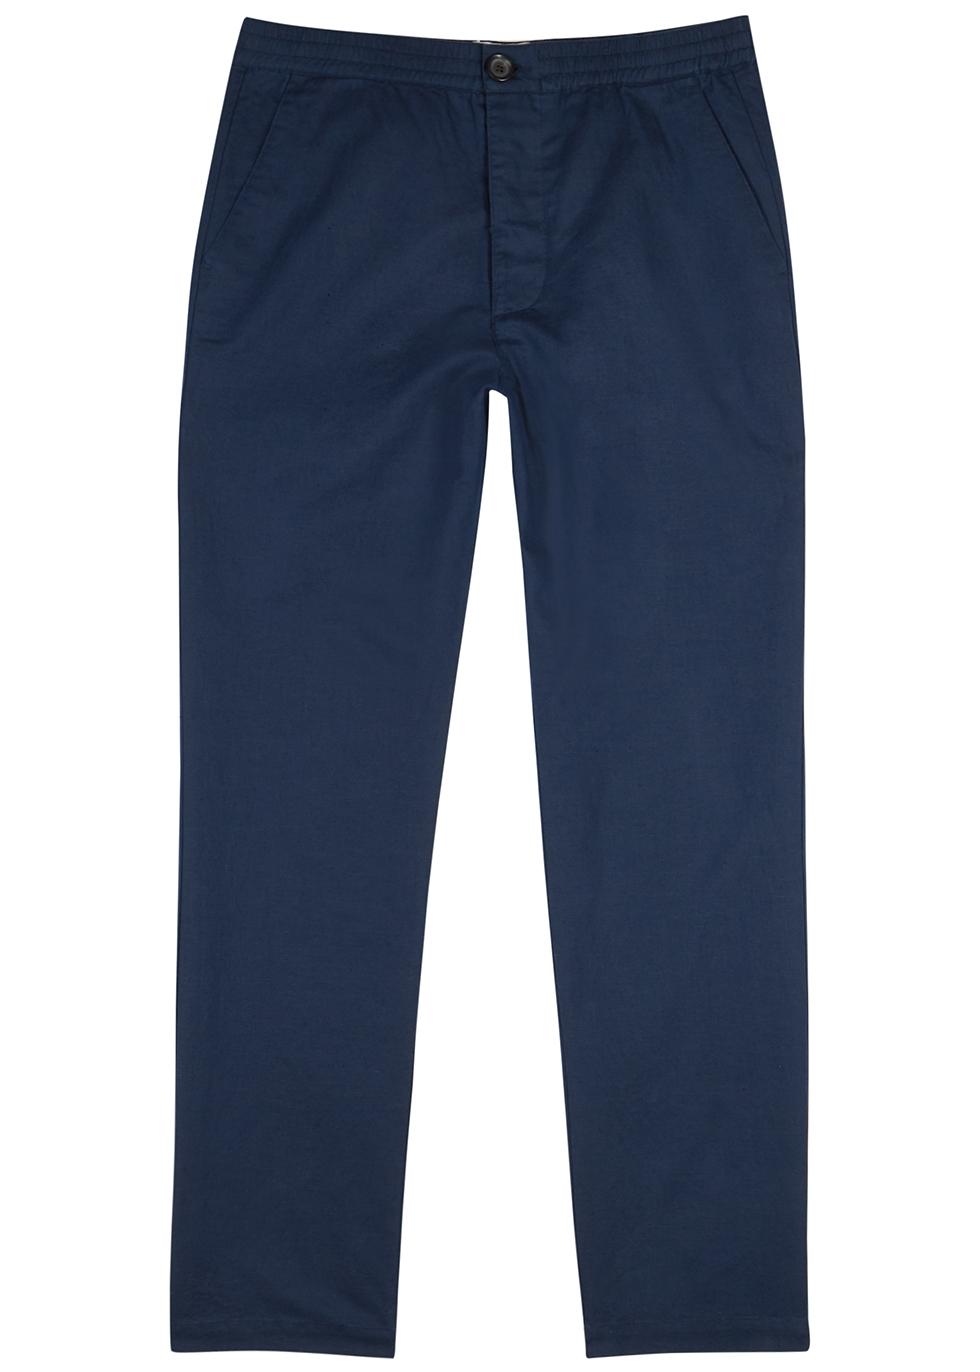 Linton navy linen-blend trousers